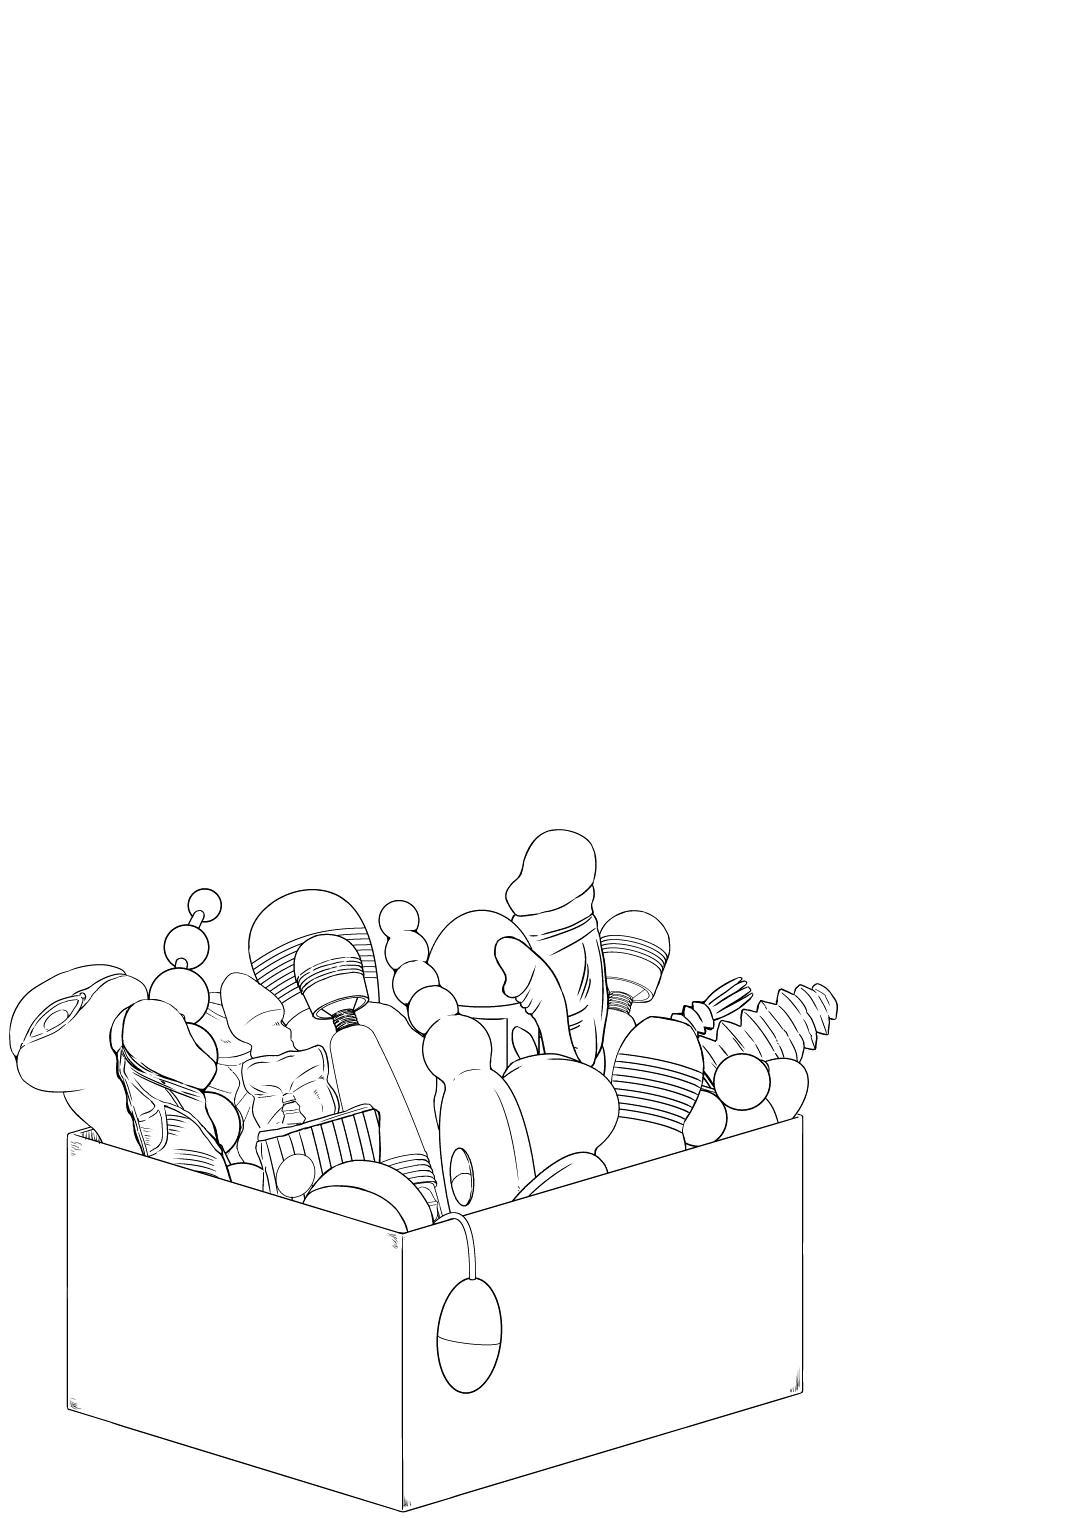 Rakuen no Omochabako   Heaven's toy box 20